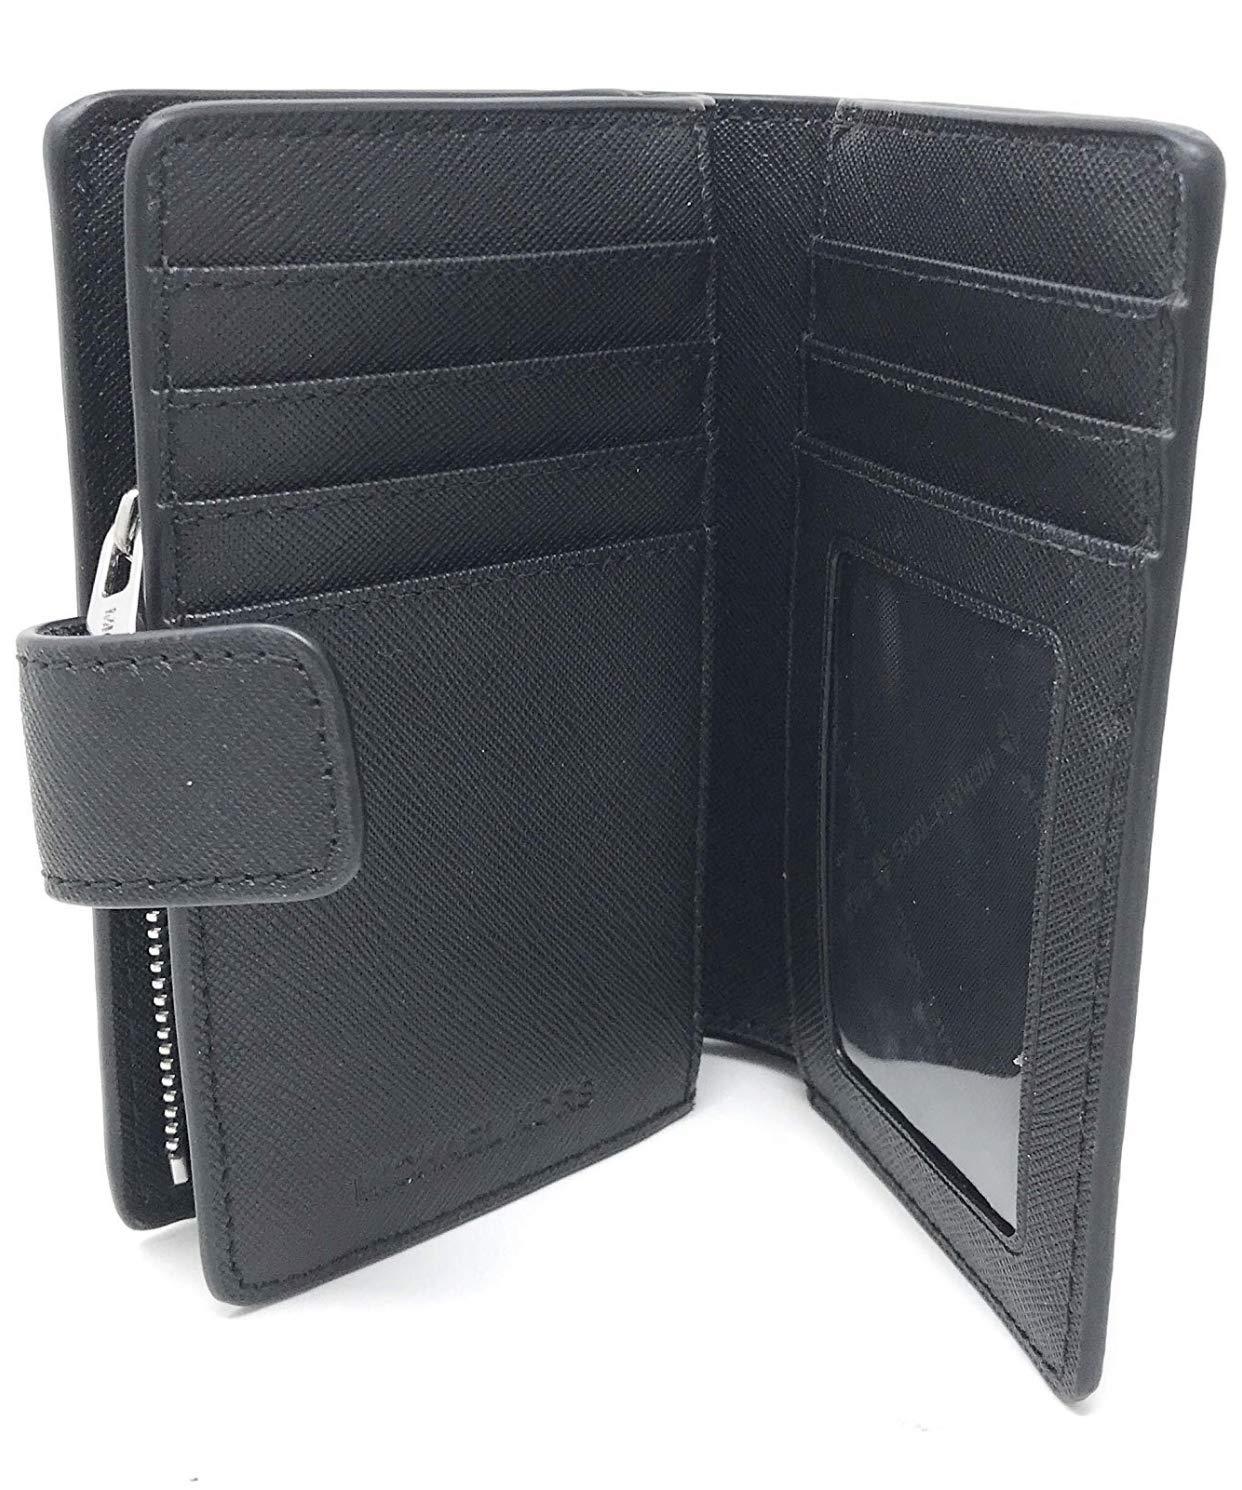 Michael Kors Jet Set Travel Saffiano Leather Bifold Zip Coin Wallet (Black PVC 2019) by Michael Kors (Image #5)